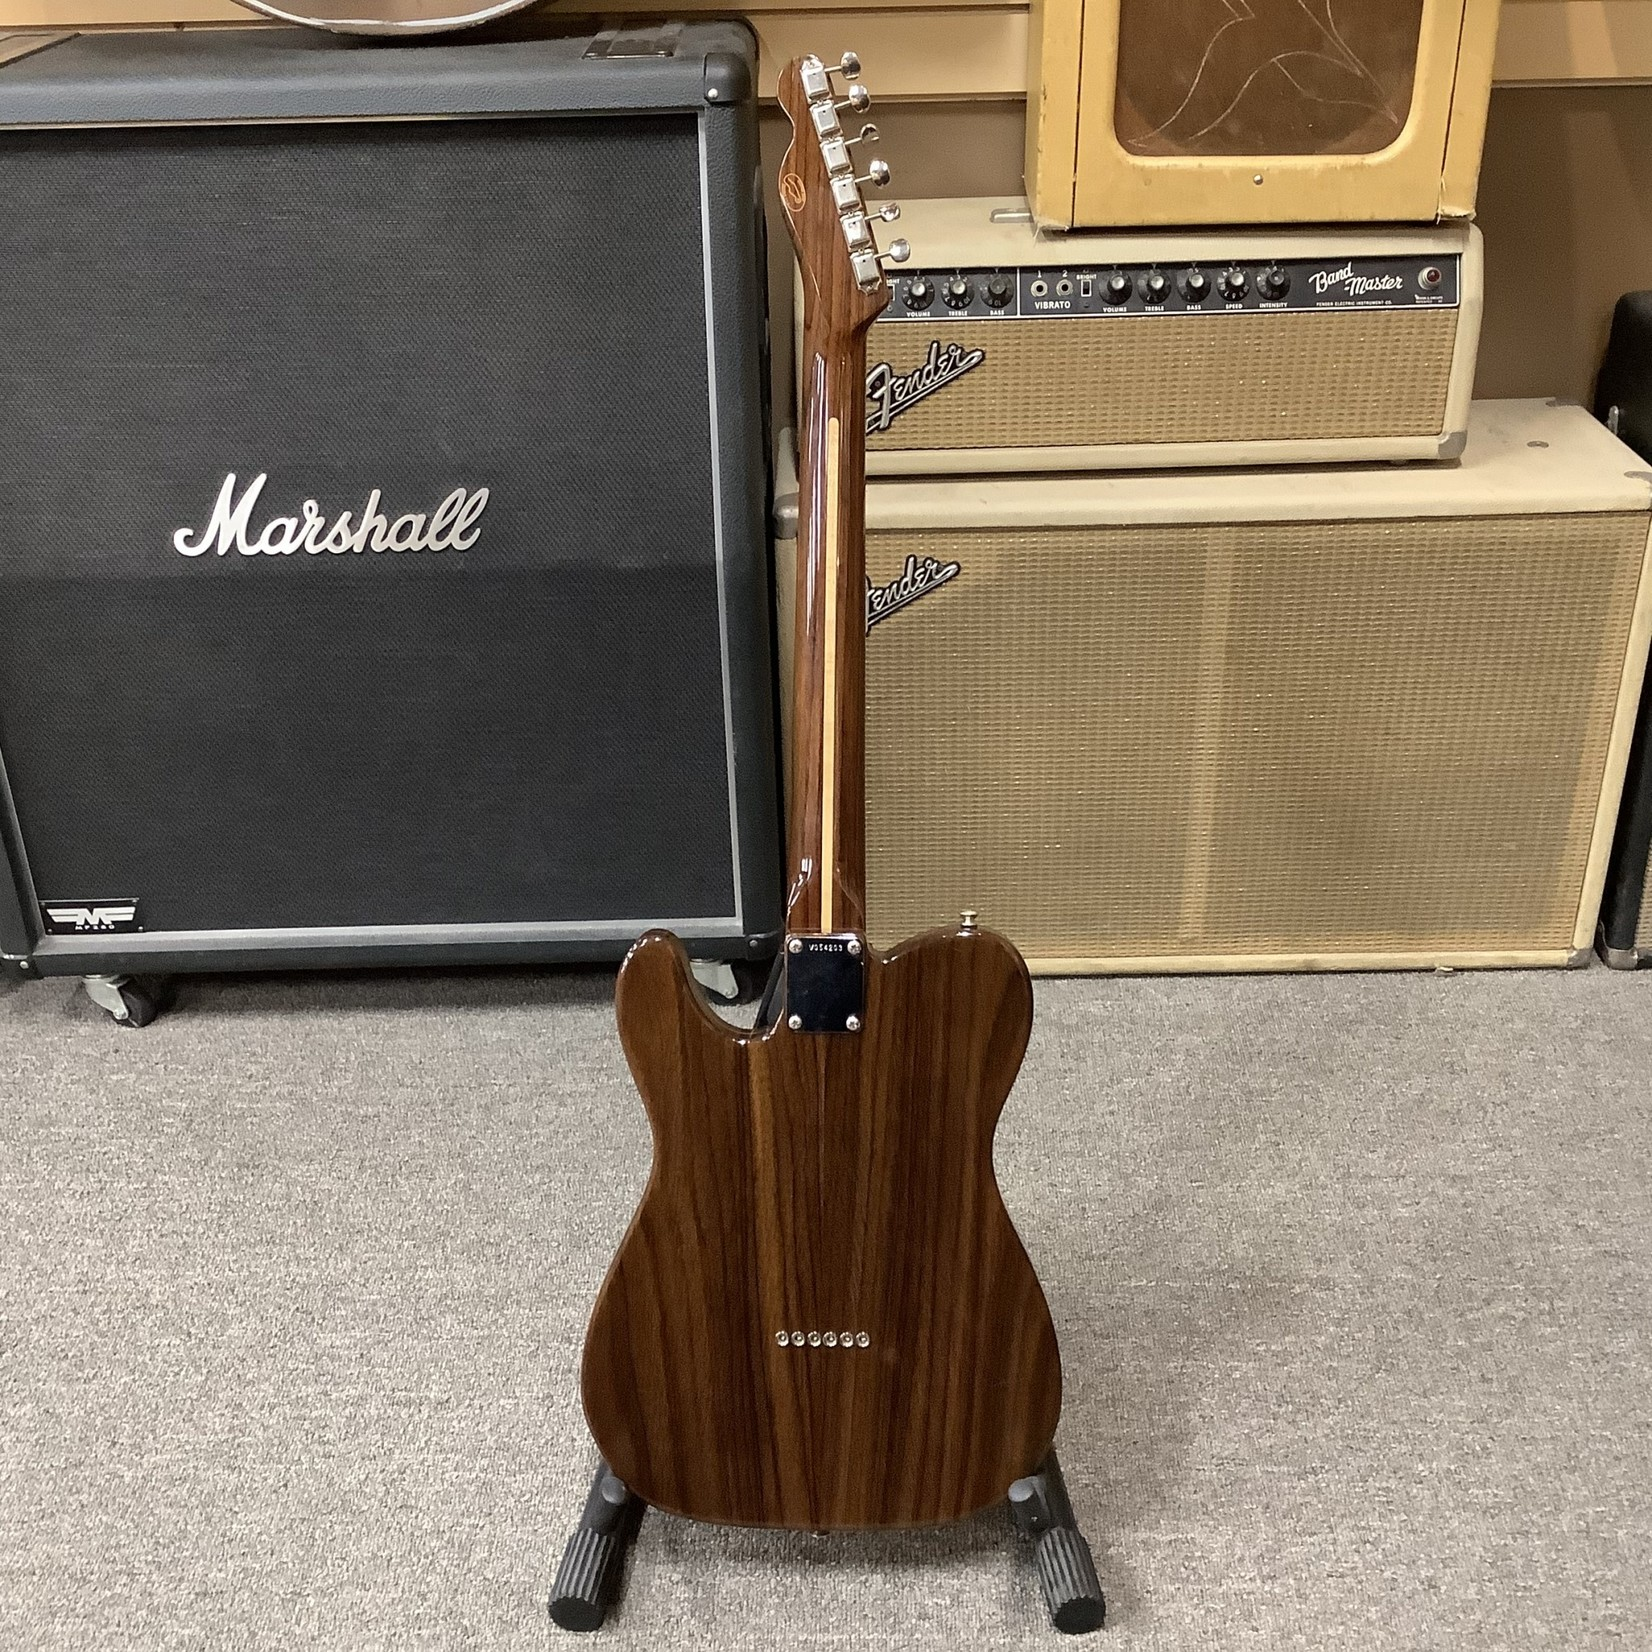 Fender 1991 Masterbuilt Fender Rosewood Telecaster Jay Madore Custom Shop